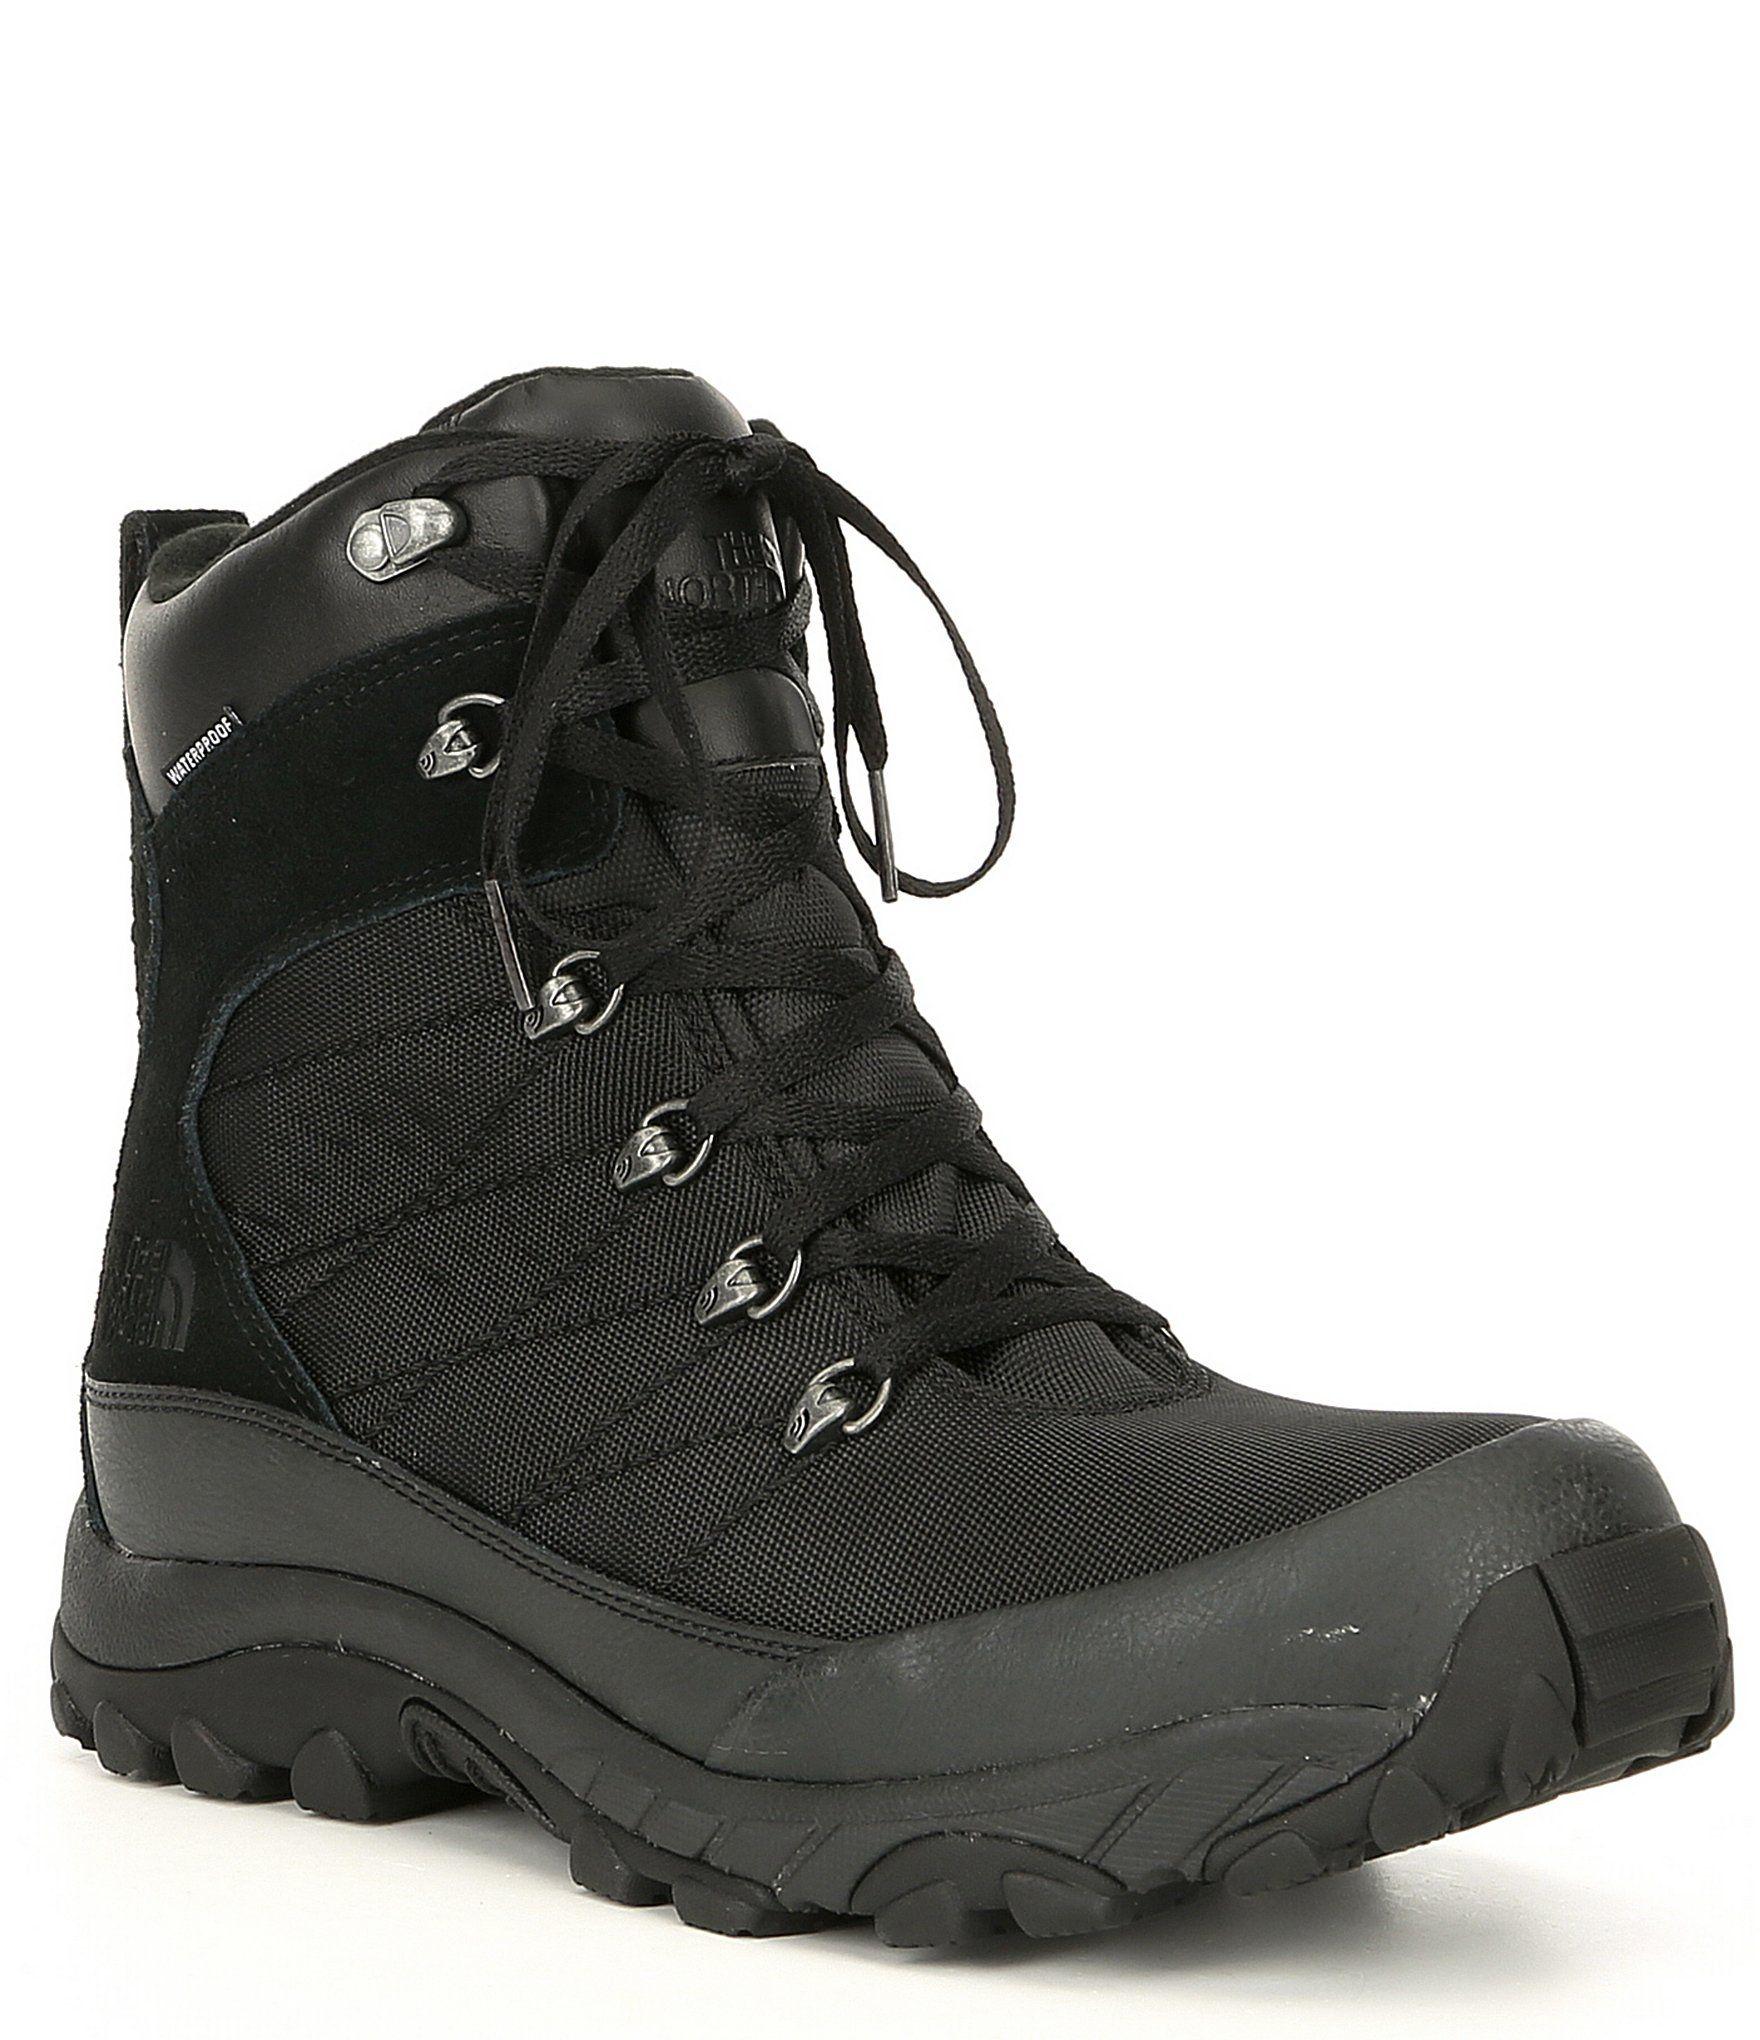 The North Face Men's Chilkat Nylon Waterproof Winter Boots – TNF Black 7.5M